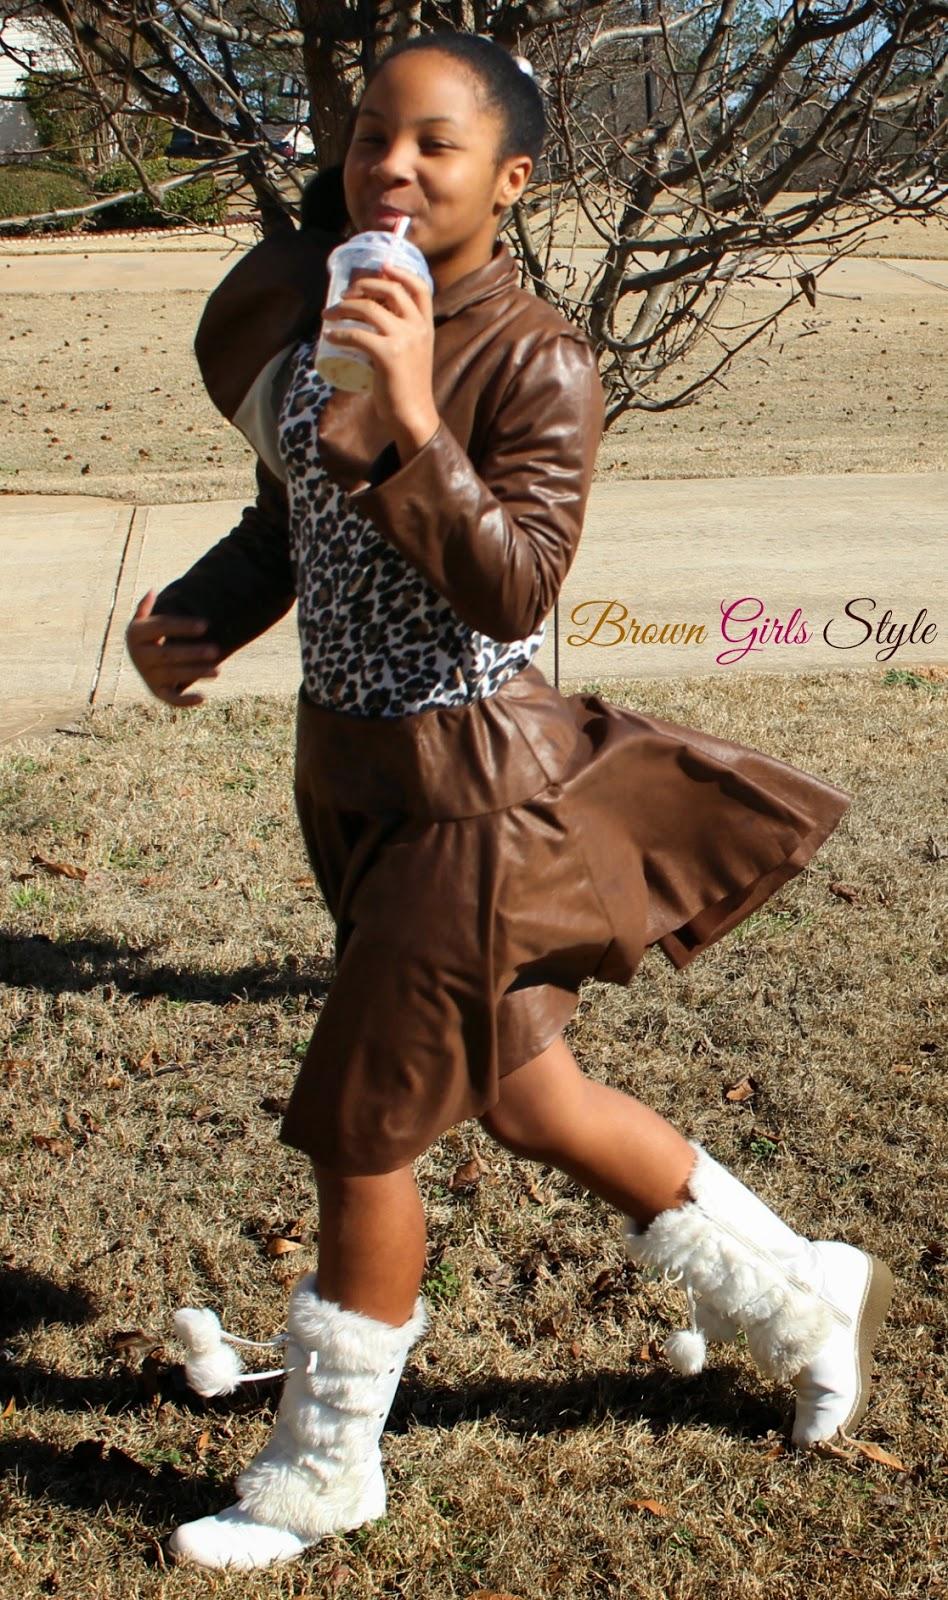 B4593 fashion girls hair styles